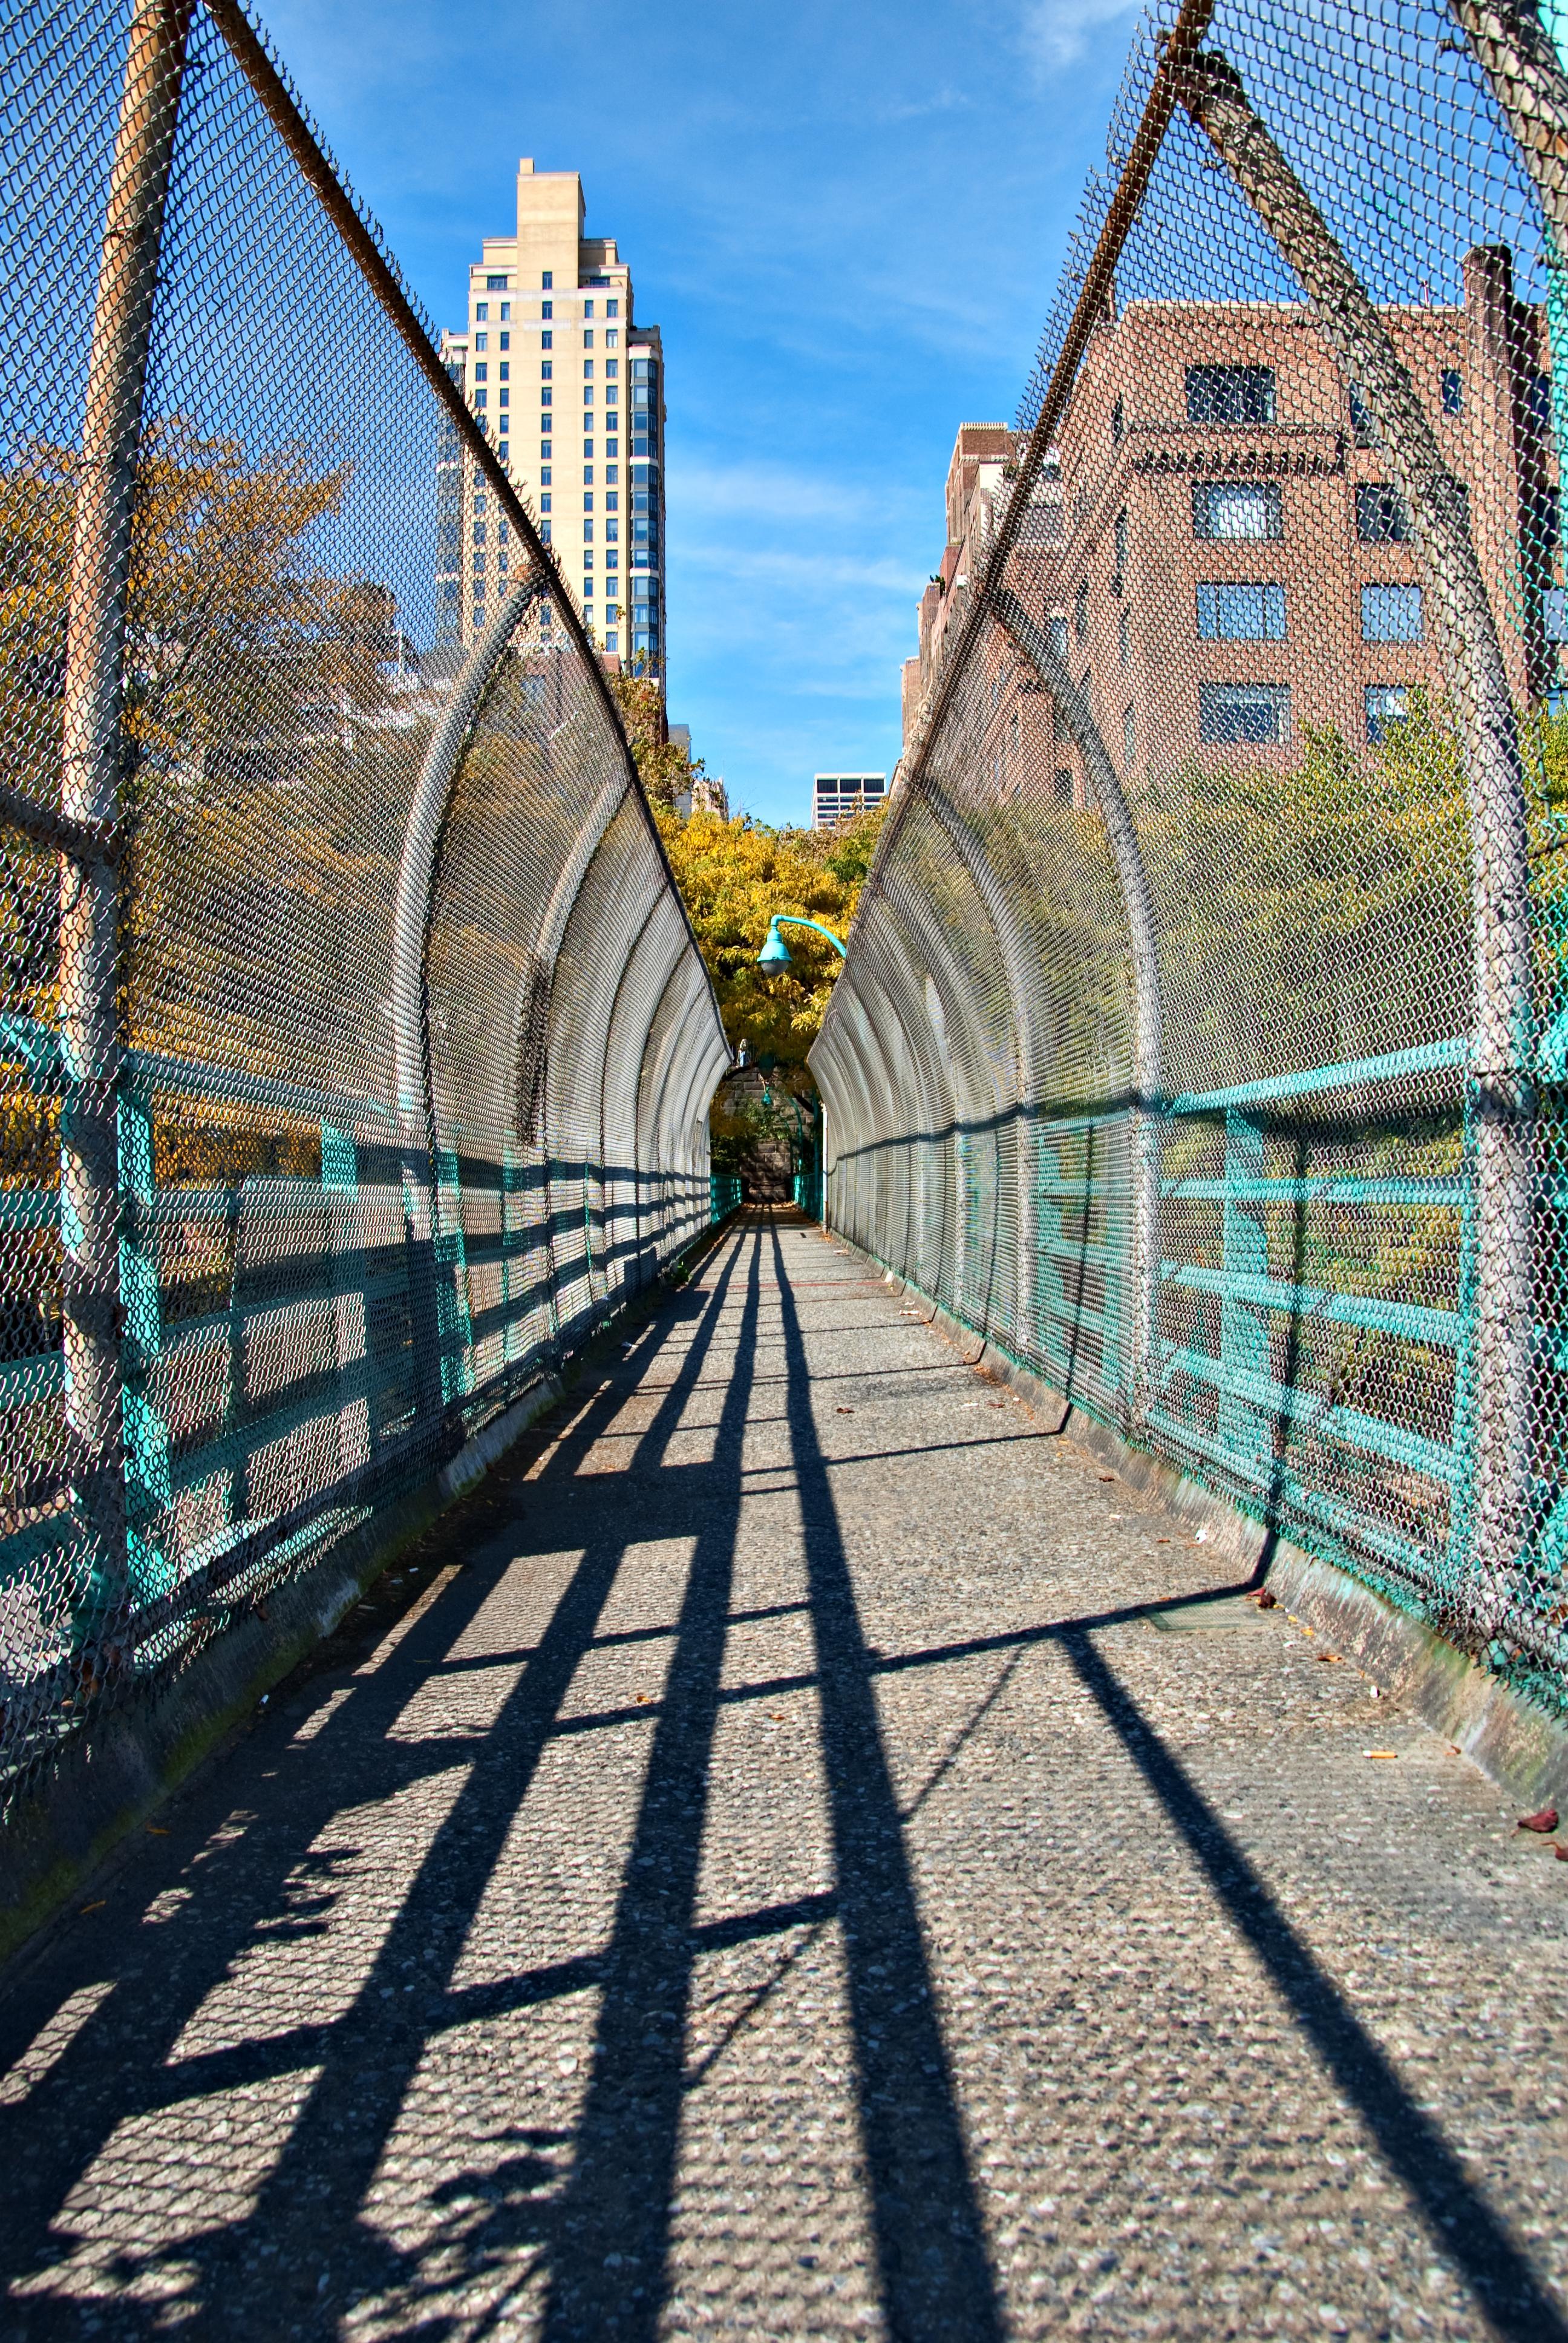 Bridge Ahmed blog